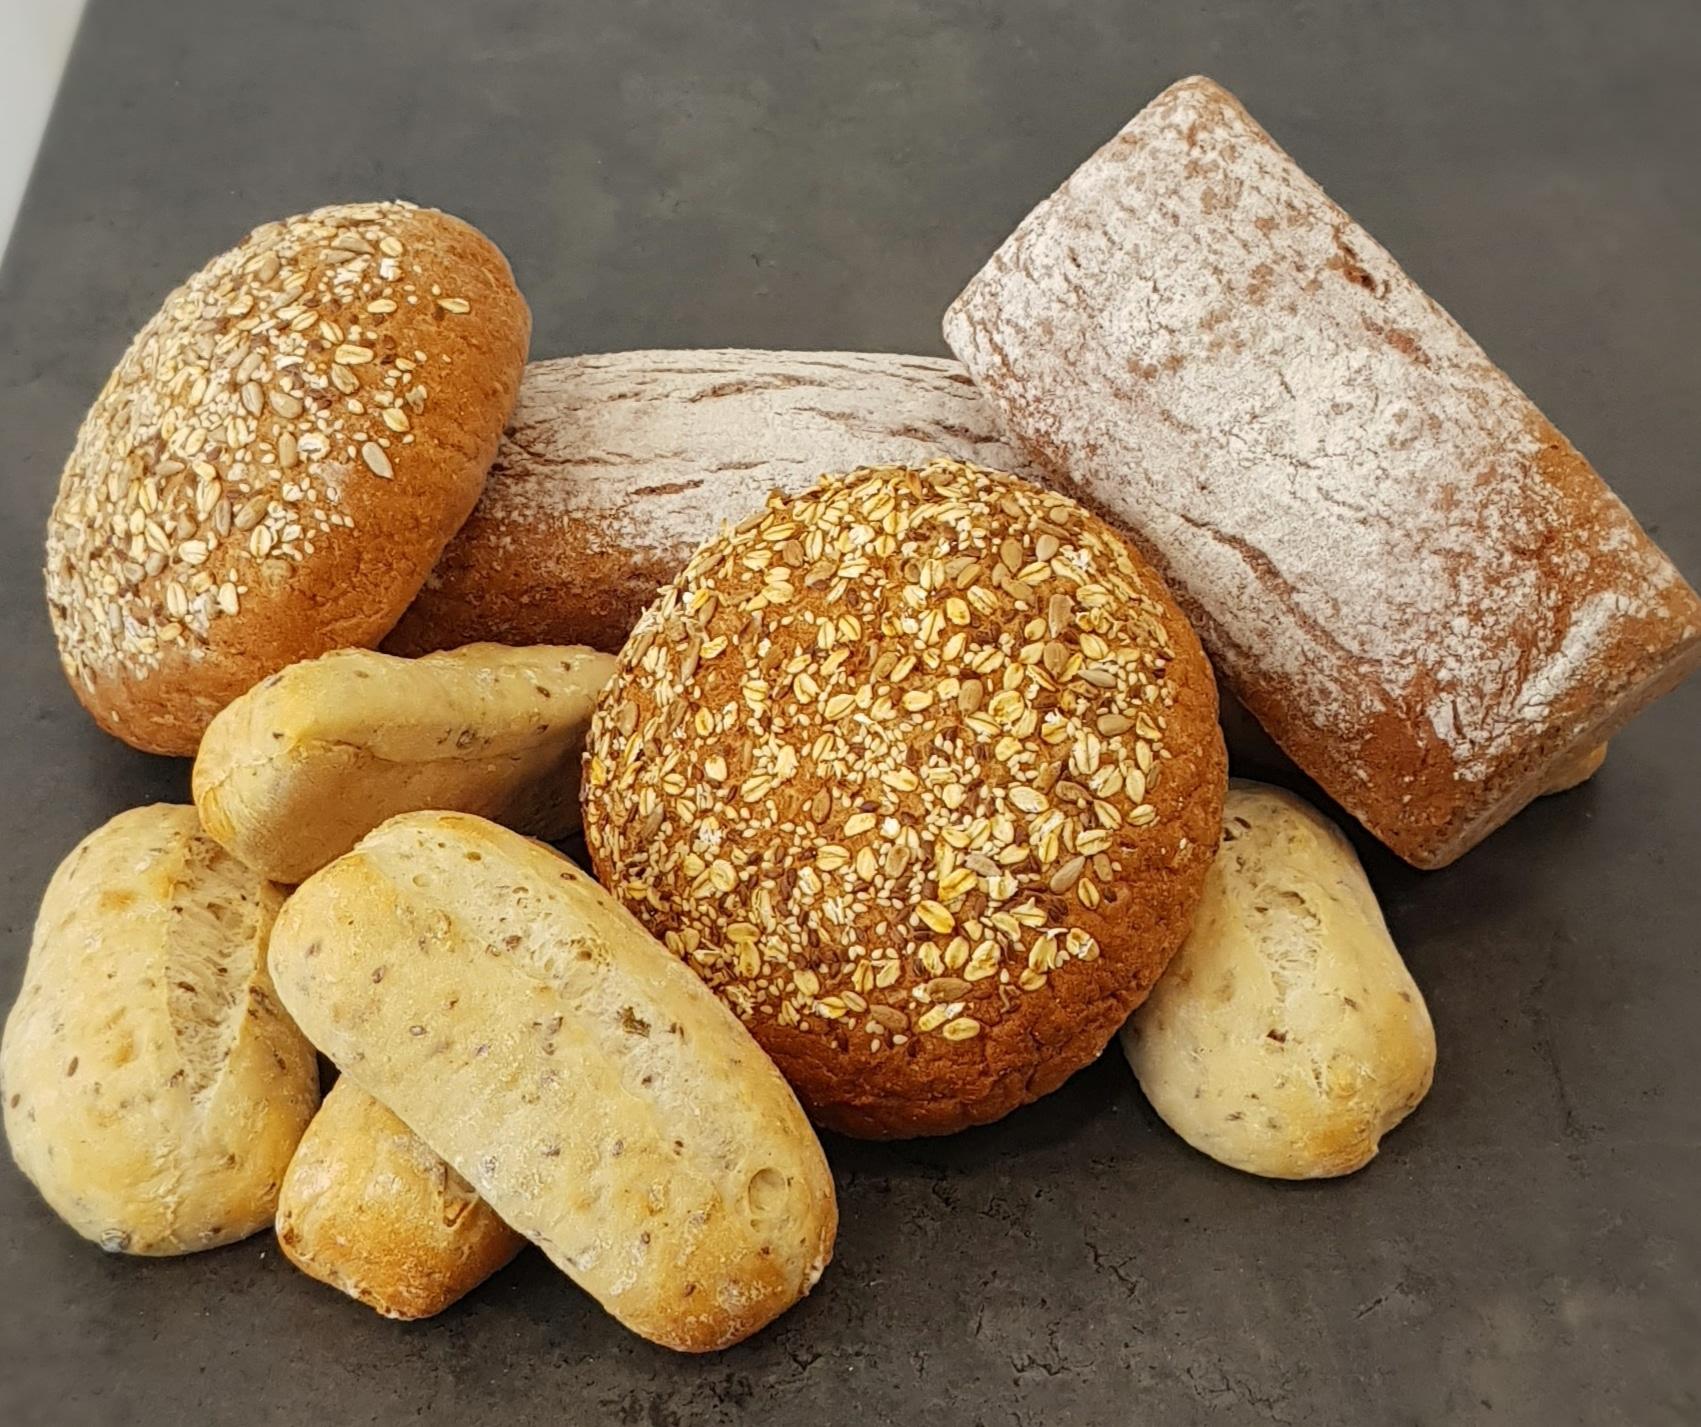 Pan de espelta. Ofrece a tus clientes todos sus beneficios